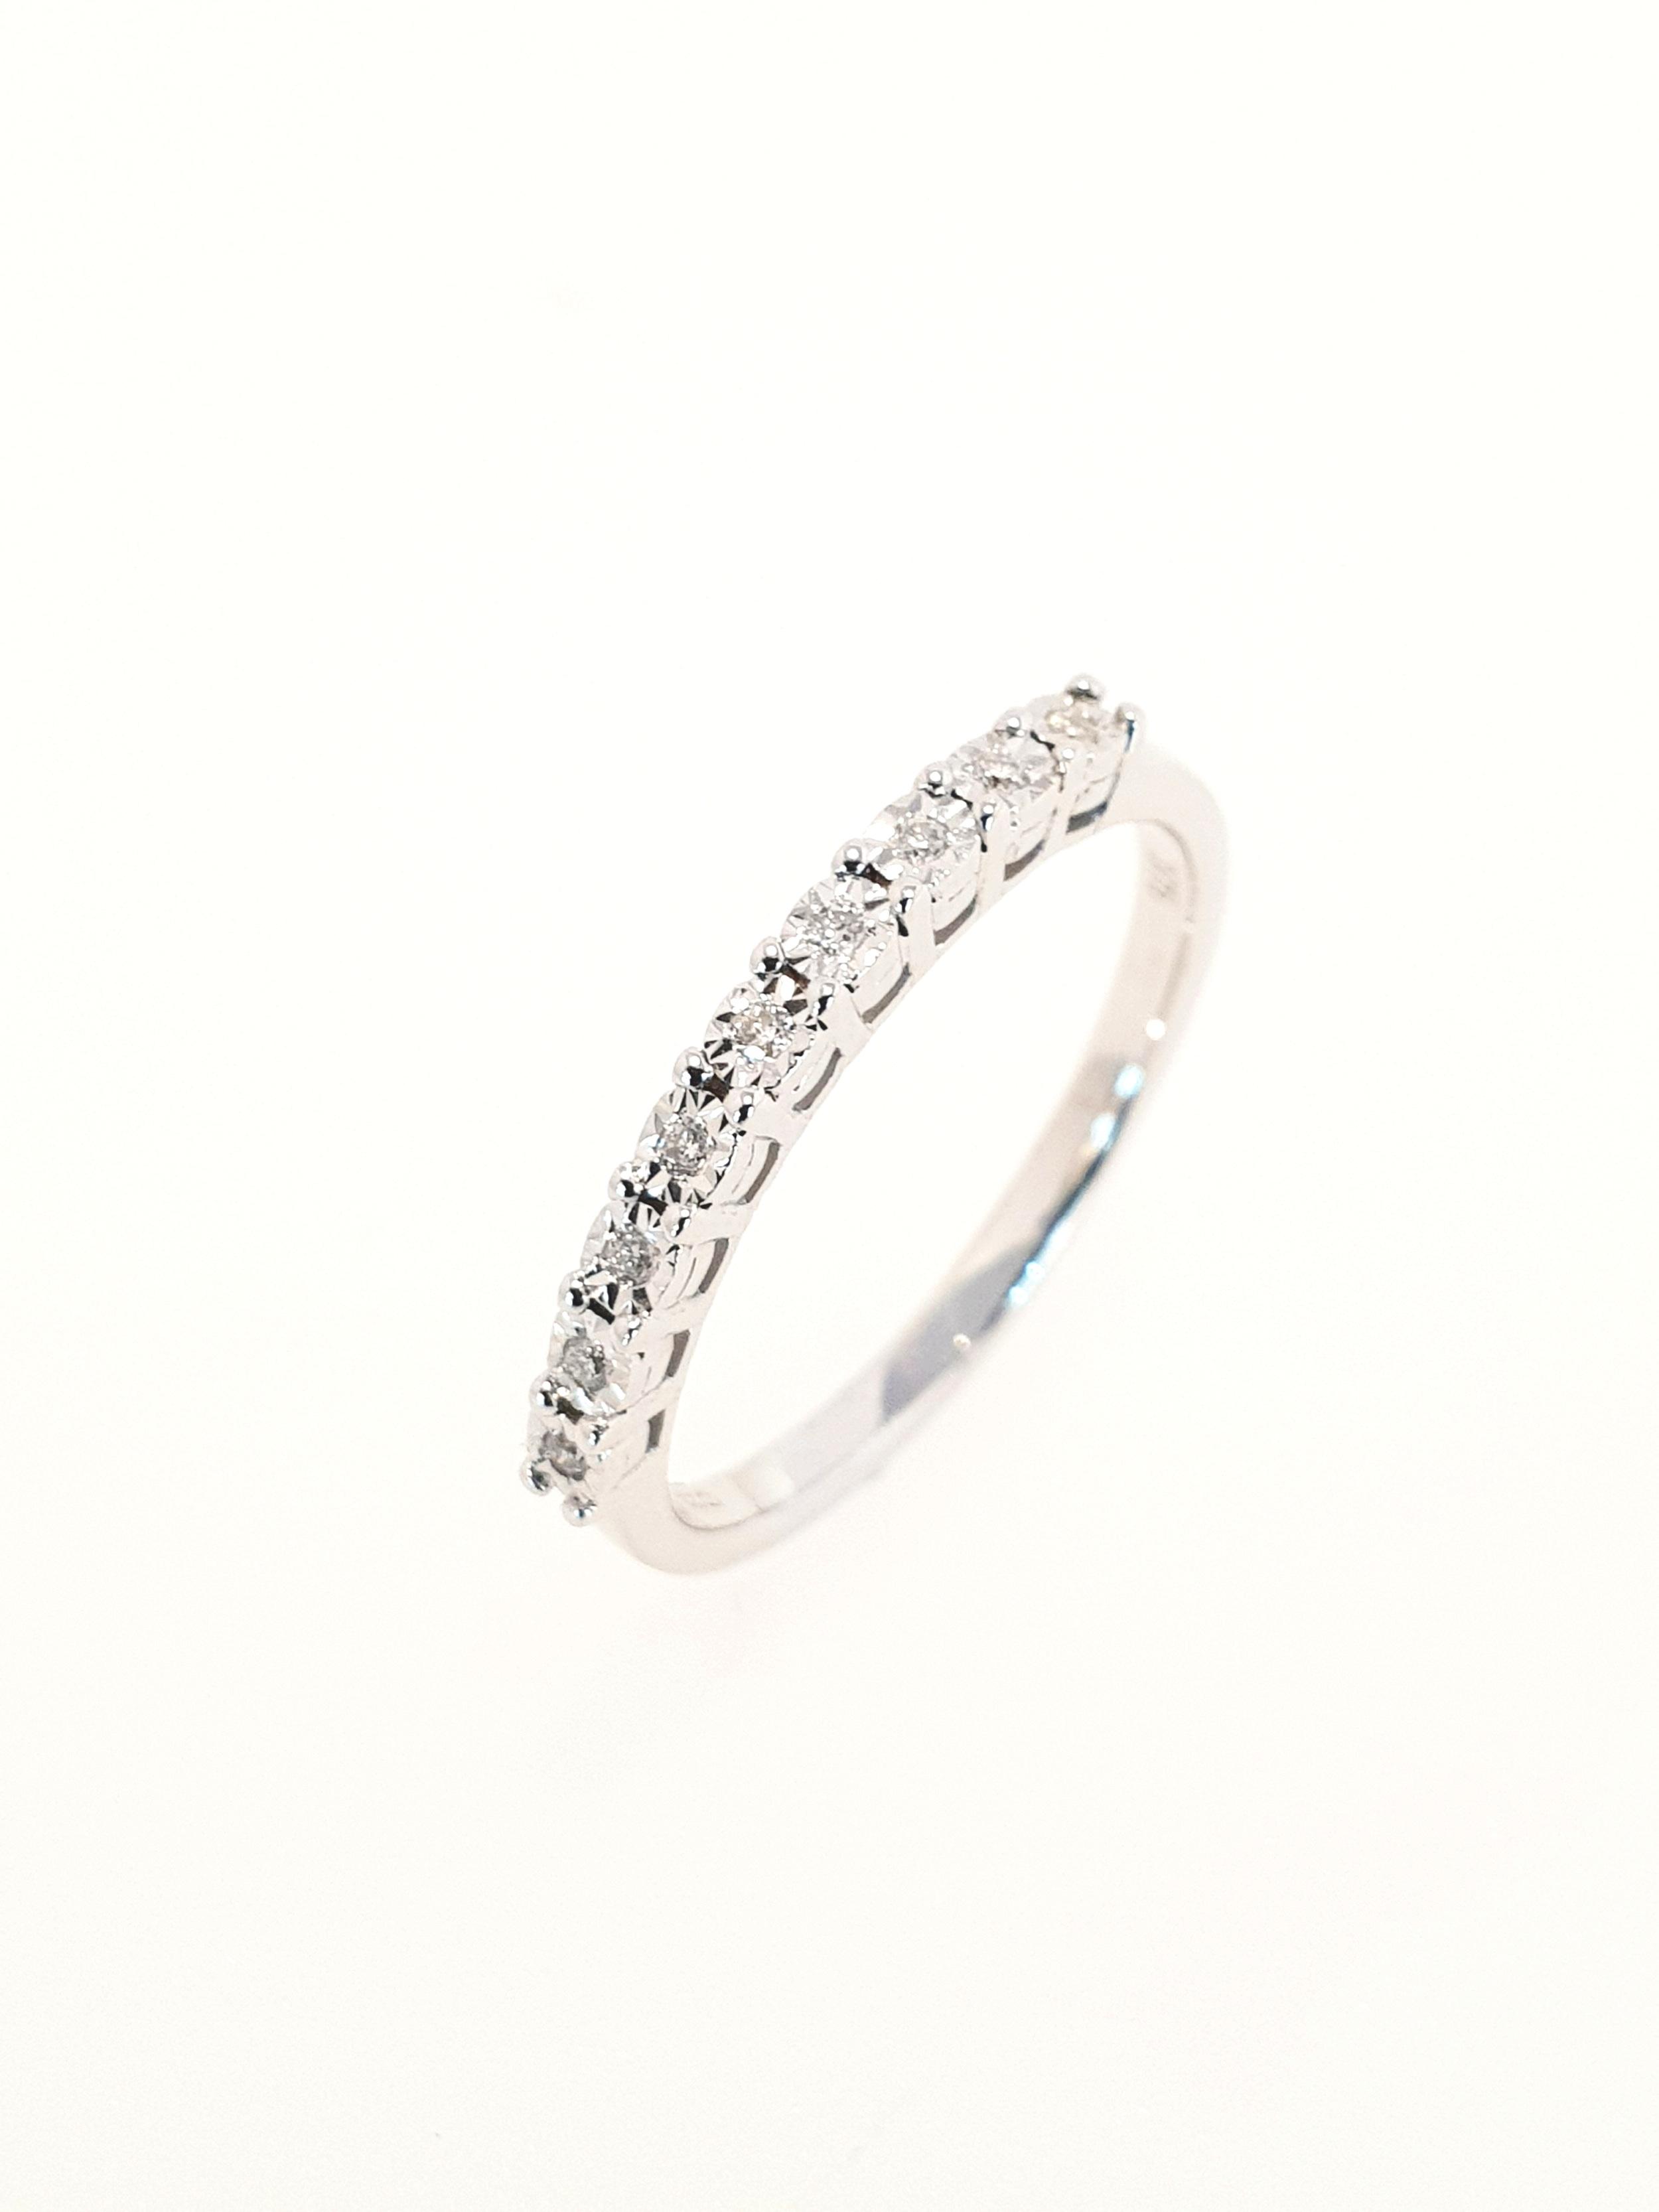 Eternity 9 Stone Diamond Ring, 9ct White Gold  .13 Total Carat Weight  Stock Code: G1956  £460